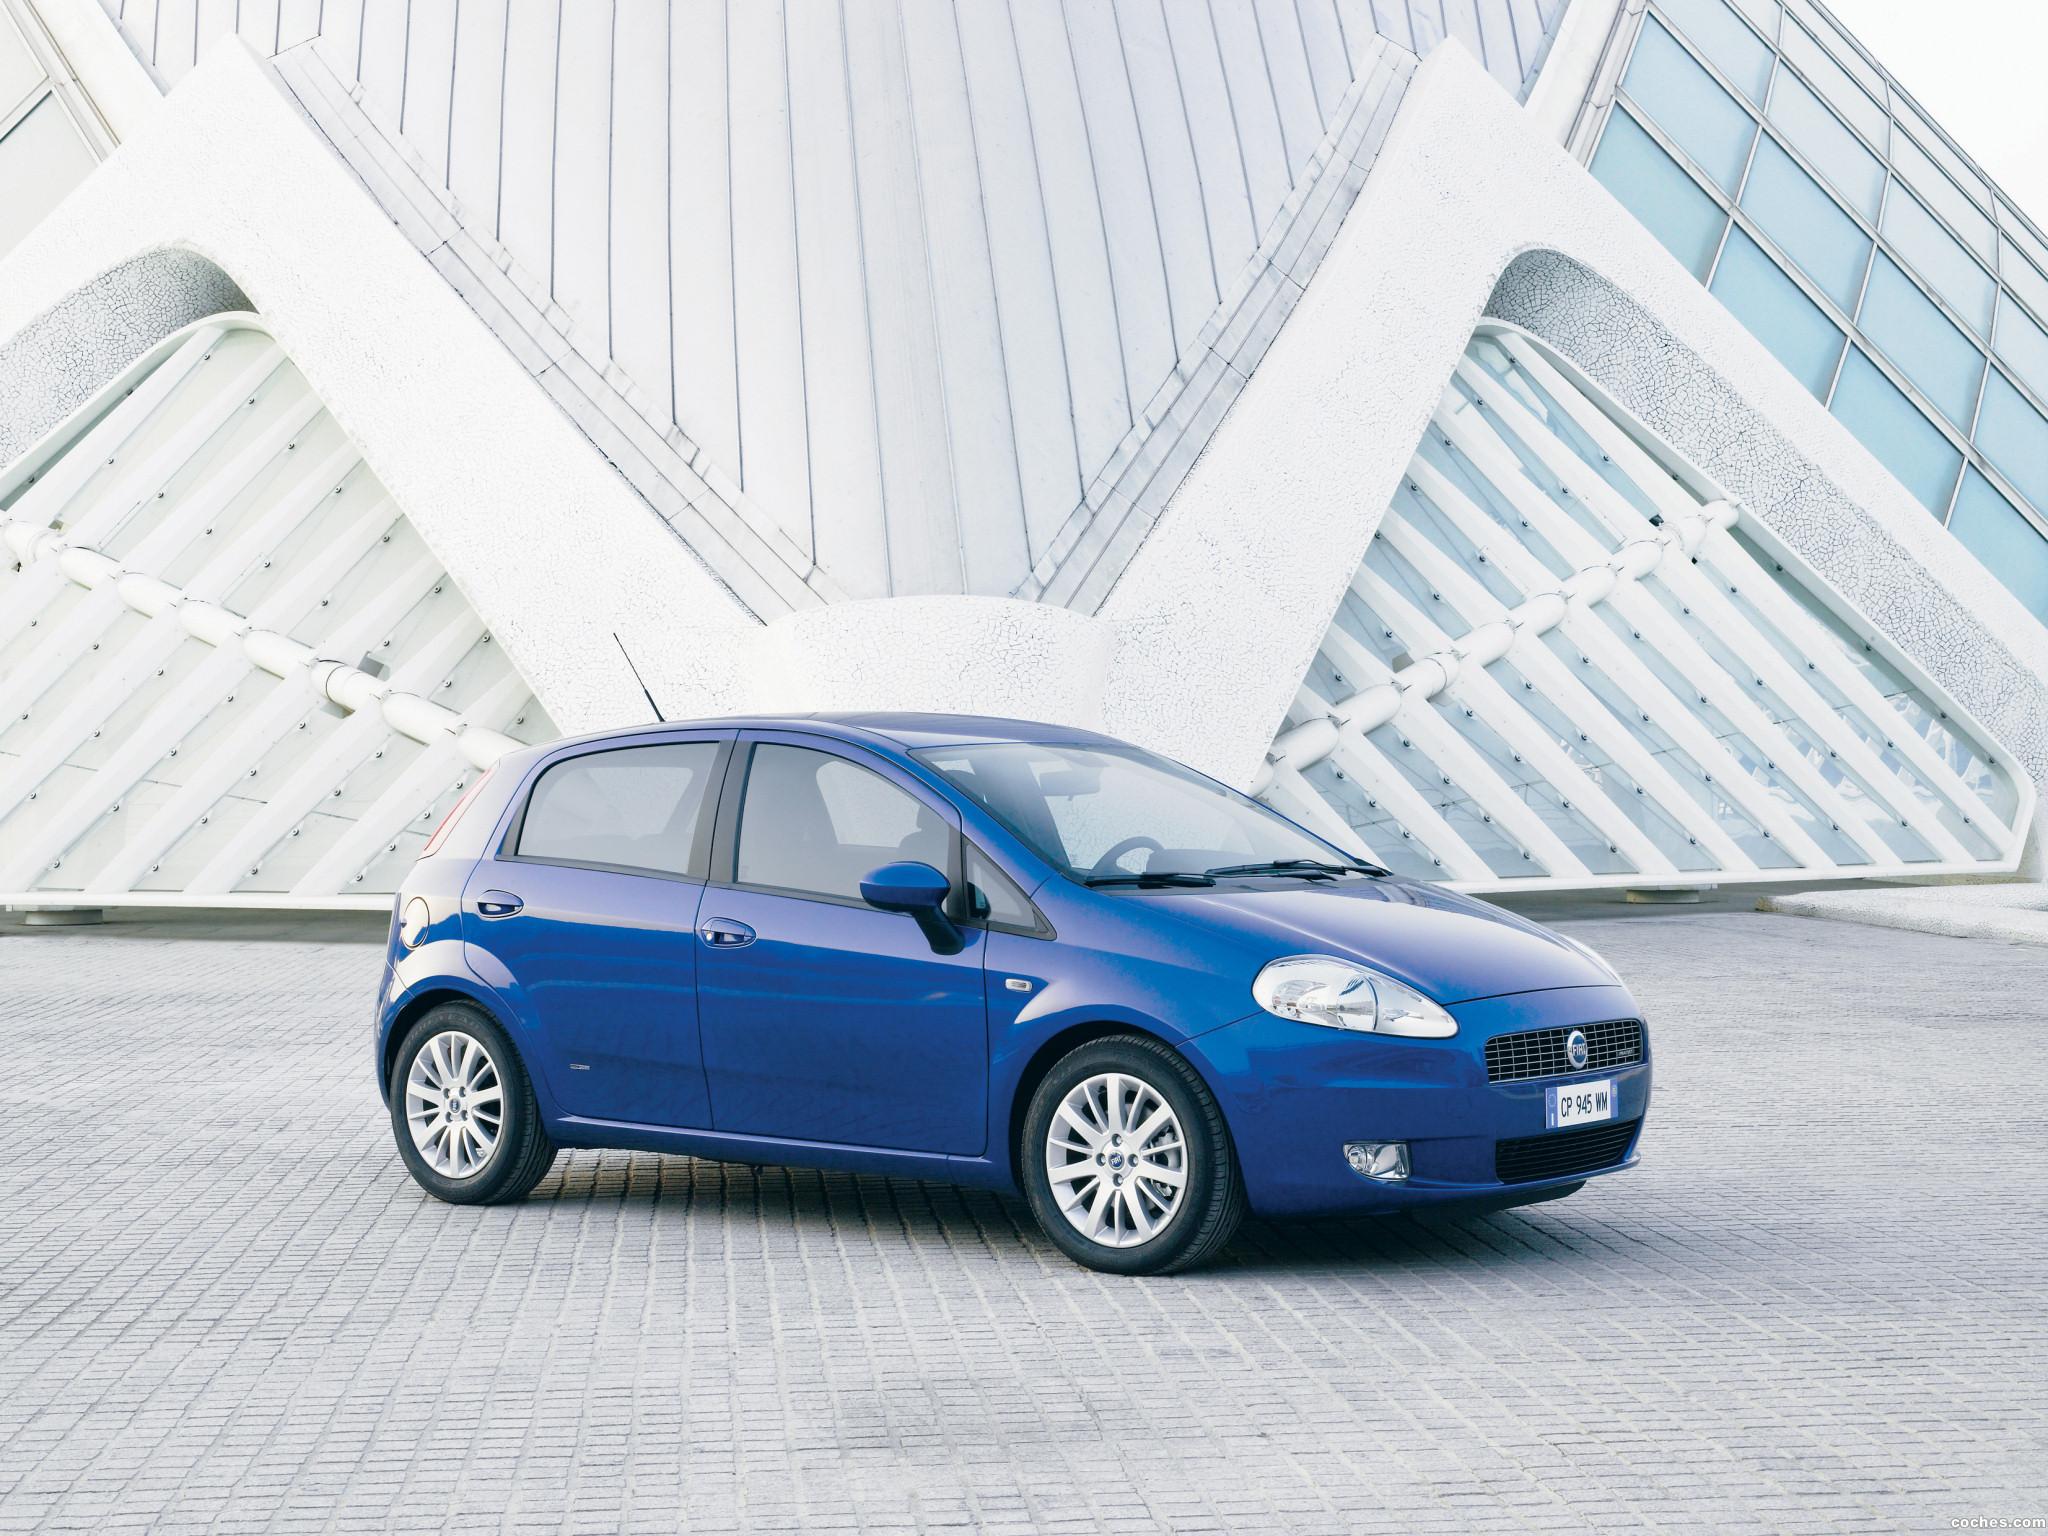 Foto 0 de Fiat Grande Punto 2005